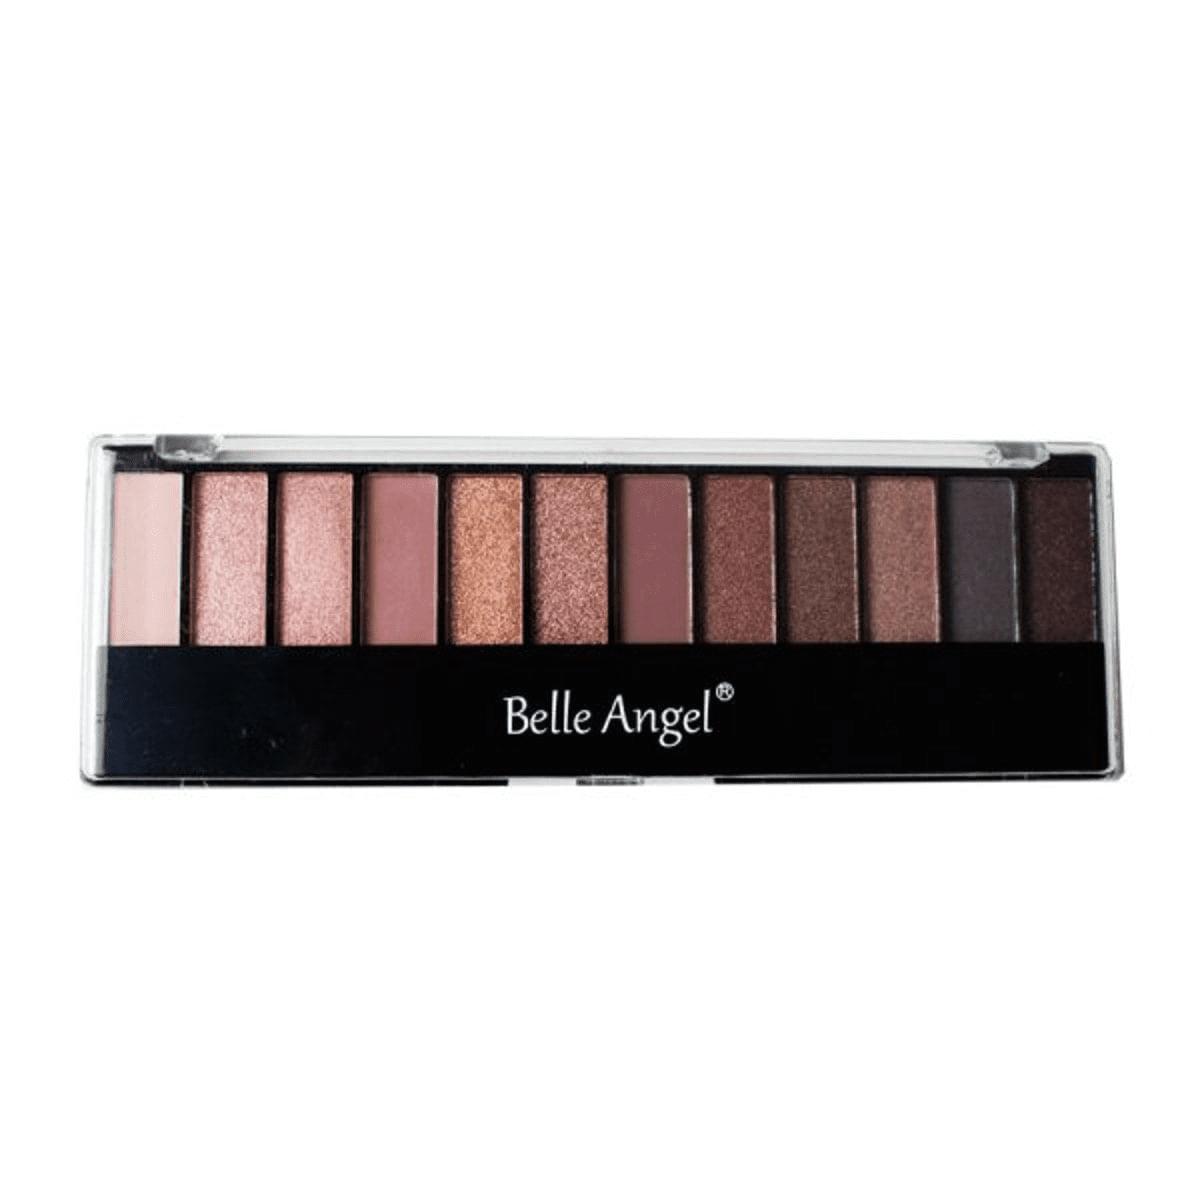 Paleta de Sombra 16.8g - Belle Angel